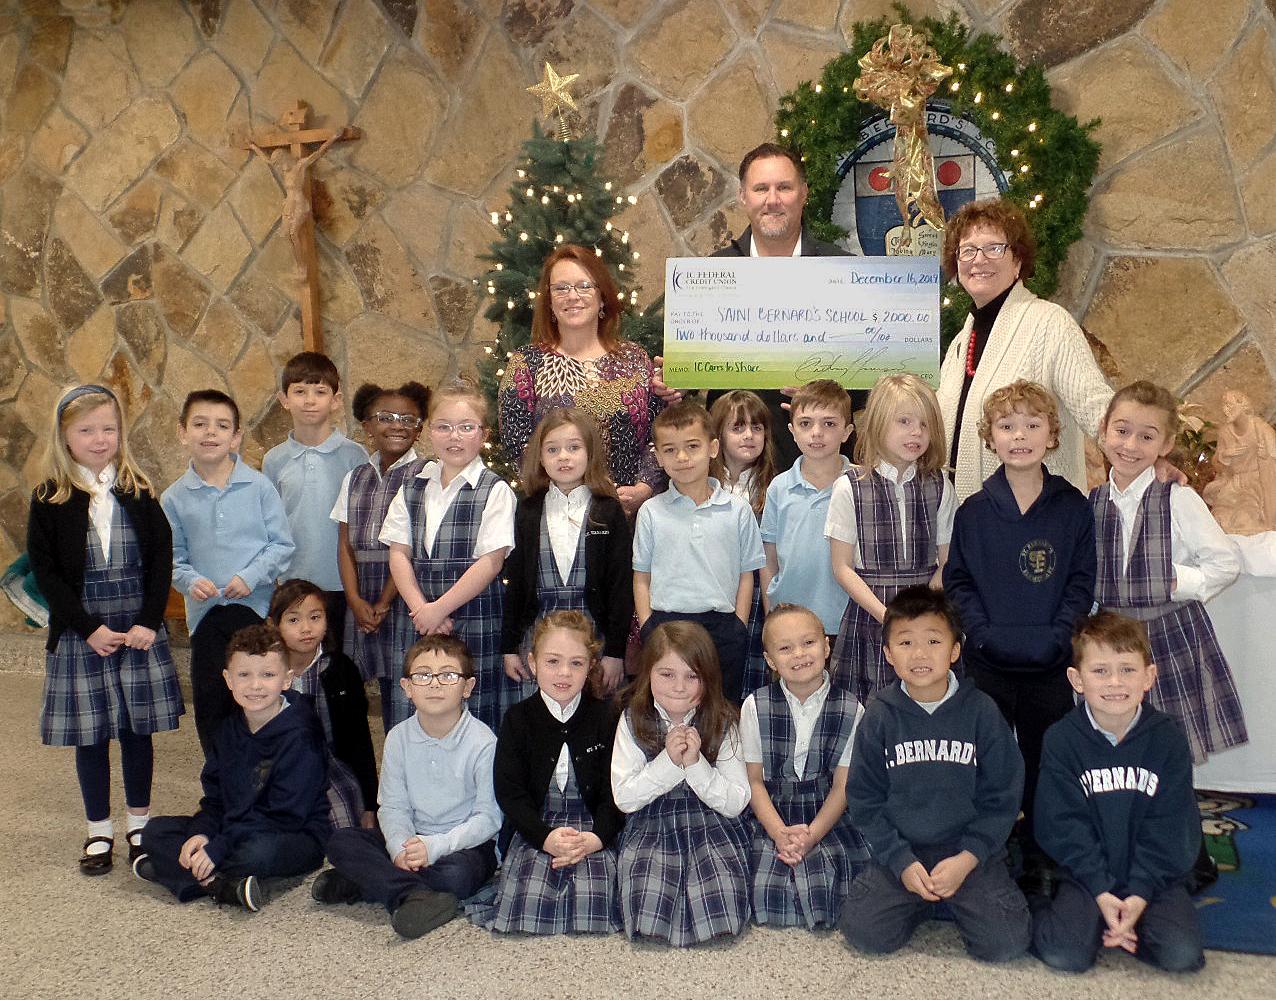 St. Bernards - IC donation